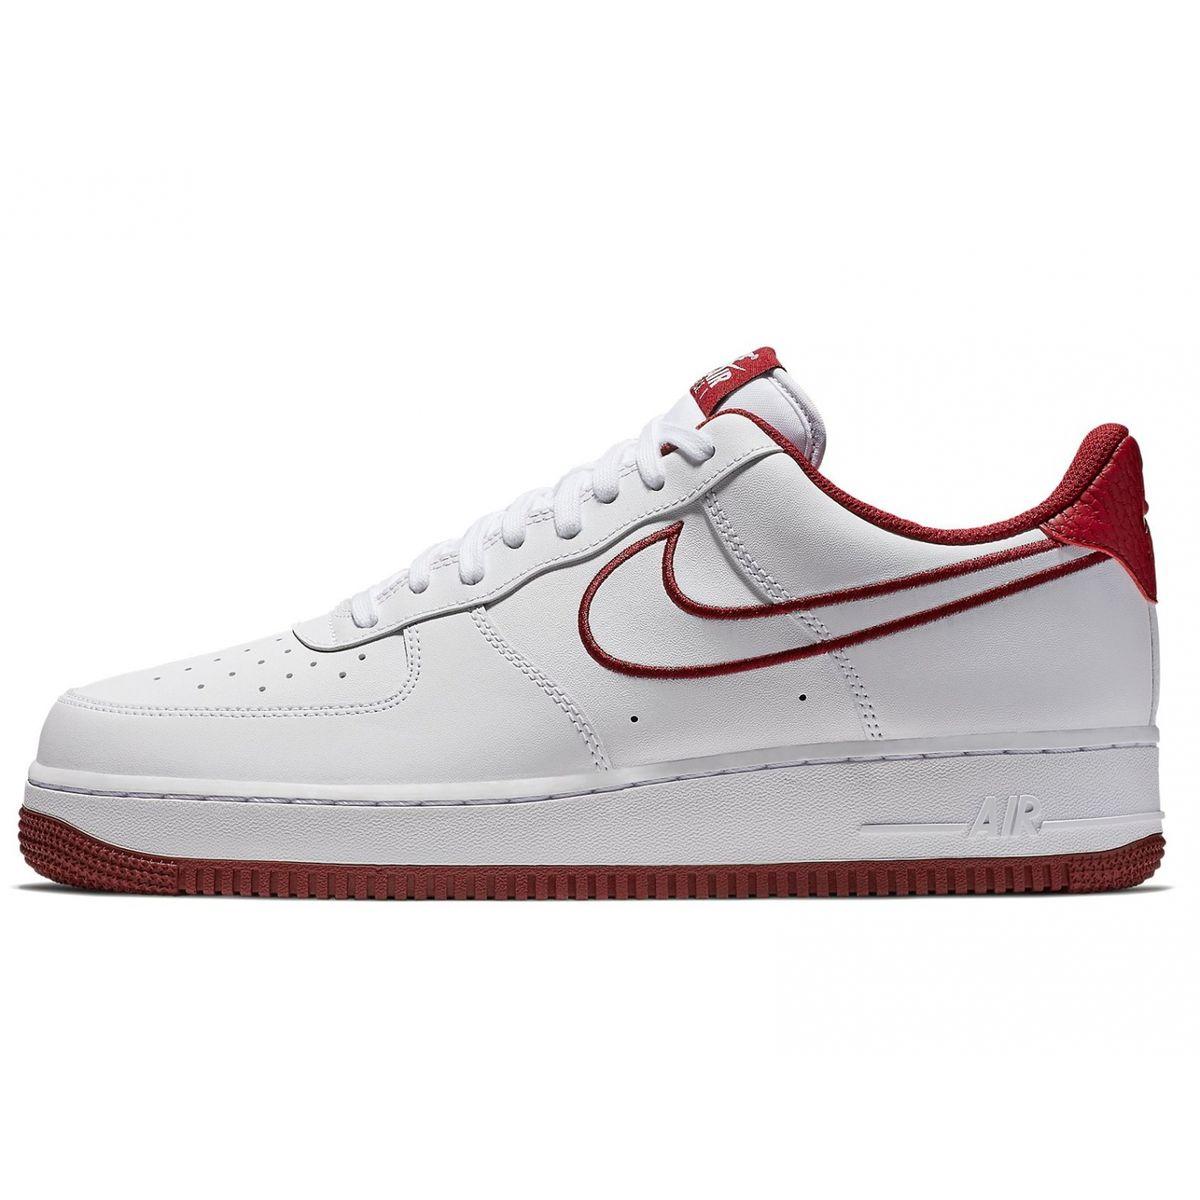 Basket Nike Air Force 1 '07 Leather Ref. Aj7280 100